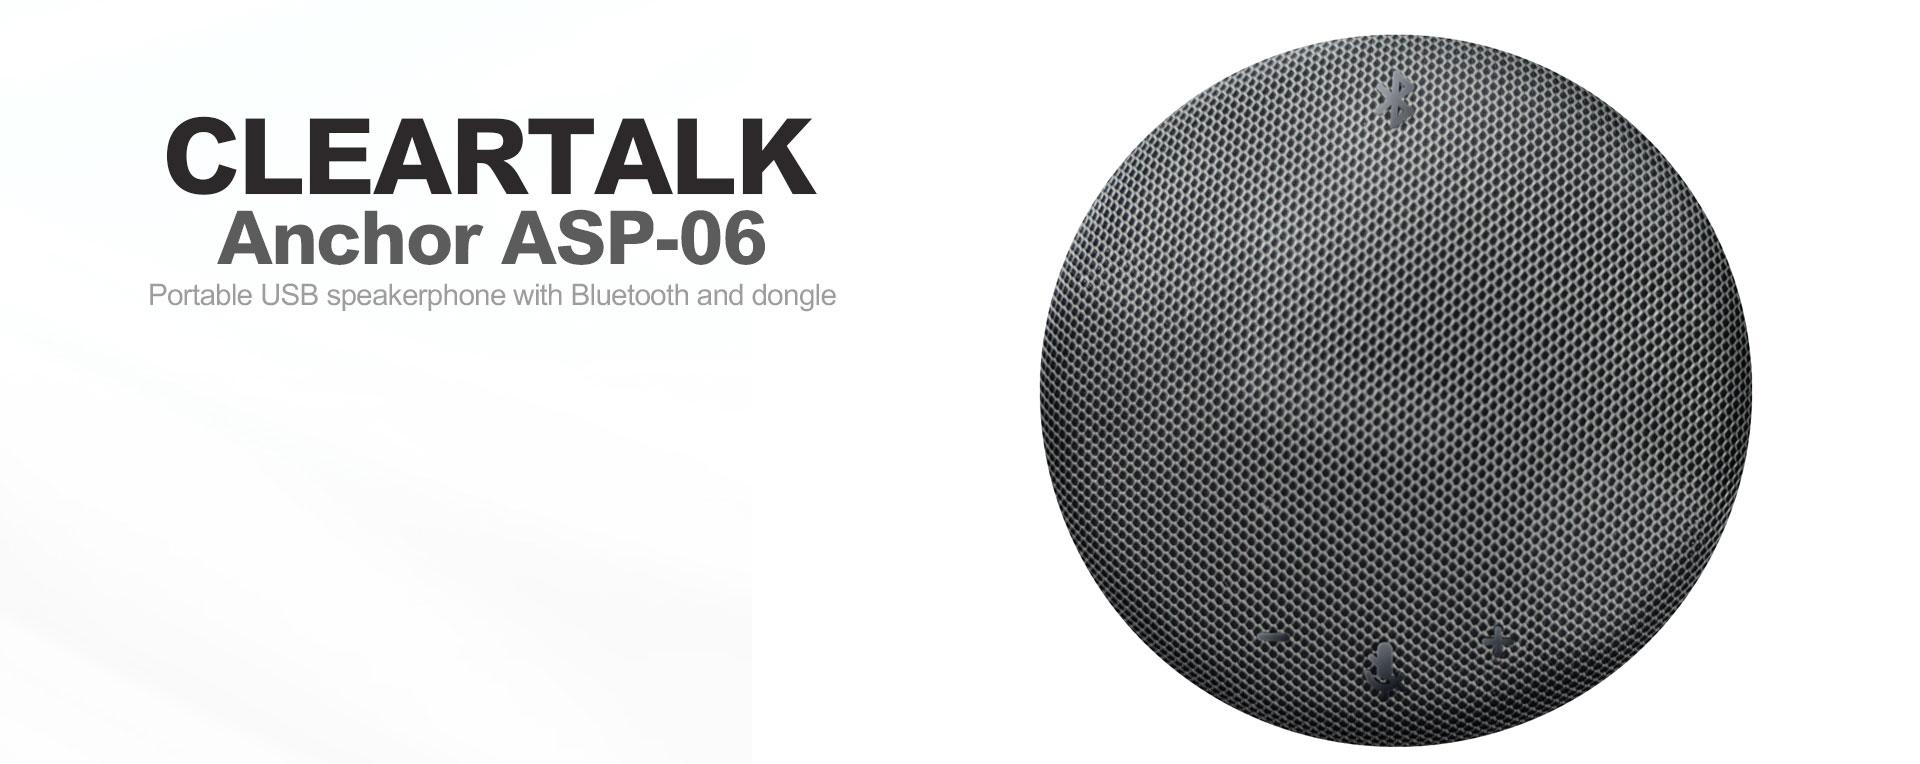 Cleartalk Speakerphone (ASP-06)